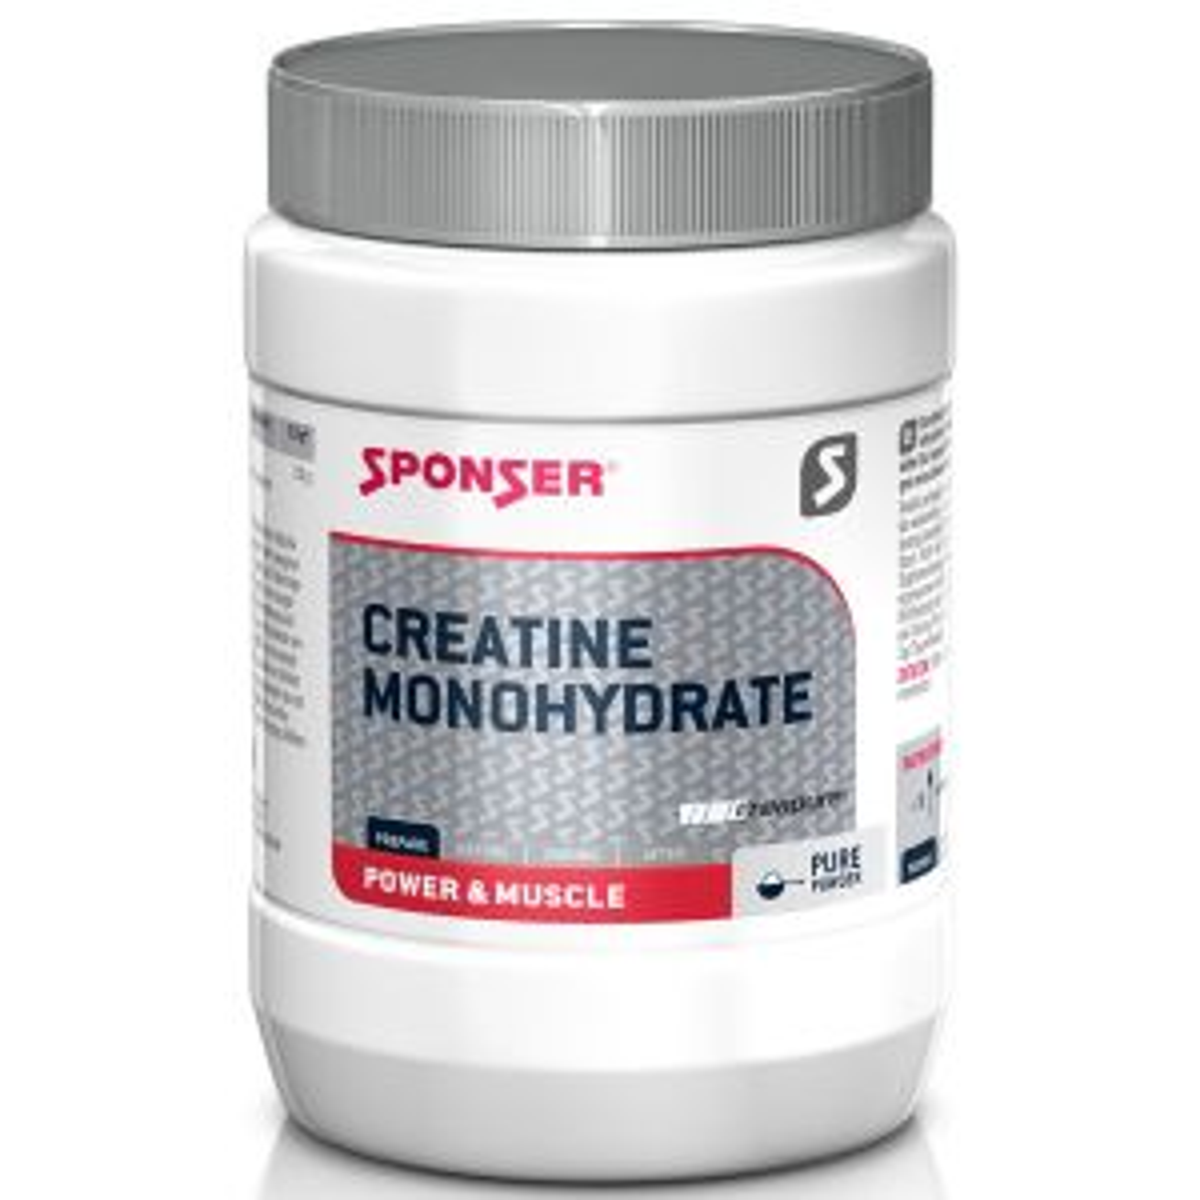 Kreatin Monohydrat Nahrungsergänzungsmittel 500g - Mindesthaltbarkeitsdatum 02/2023